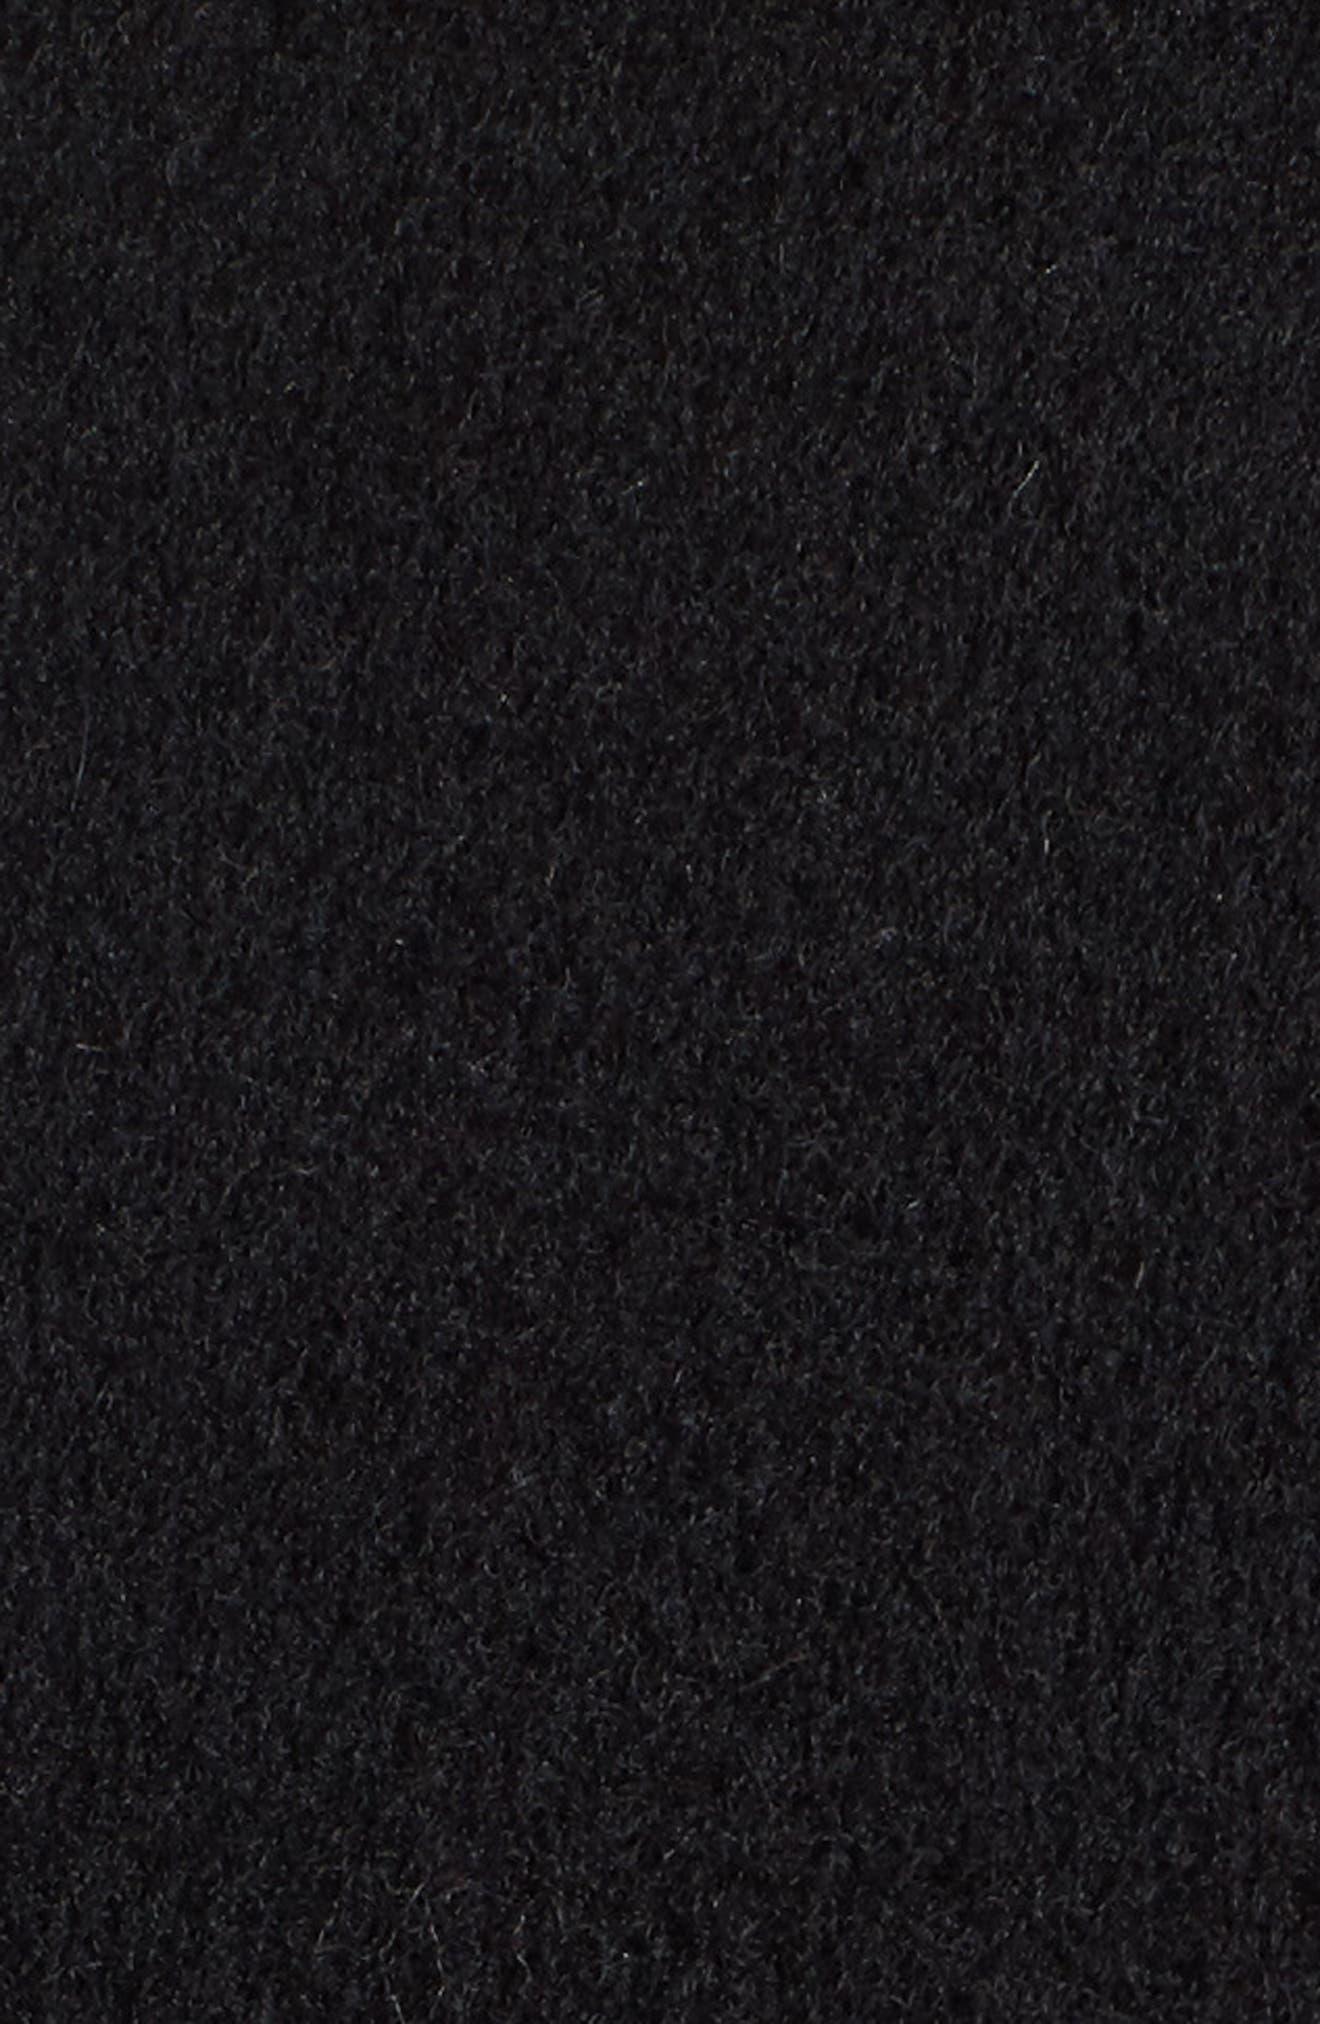 Boiled Wool Blend Wrap Coat,                             Alternate thumbnail 6, color,                             001